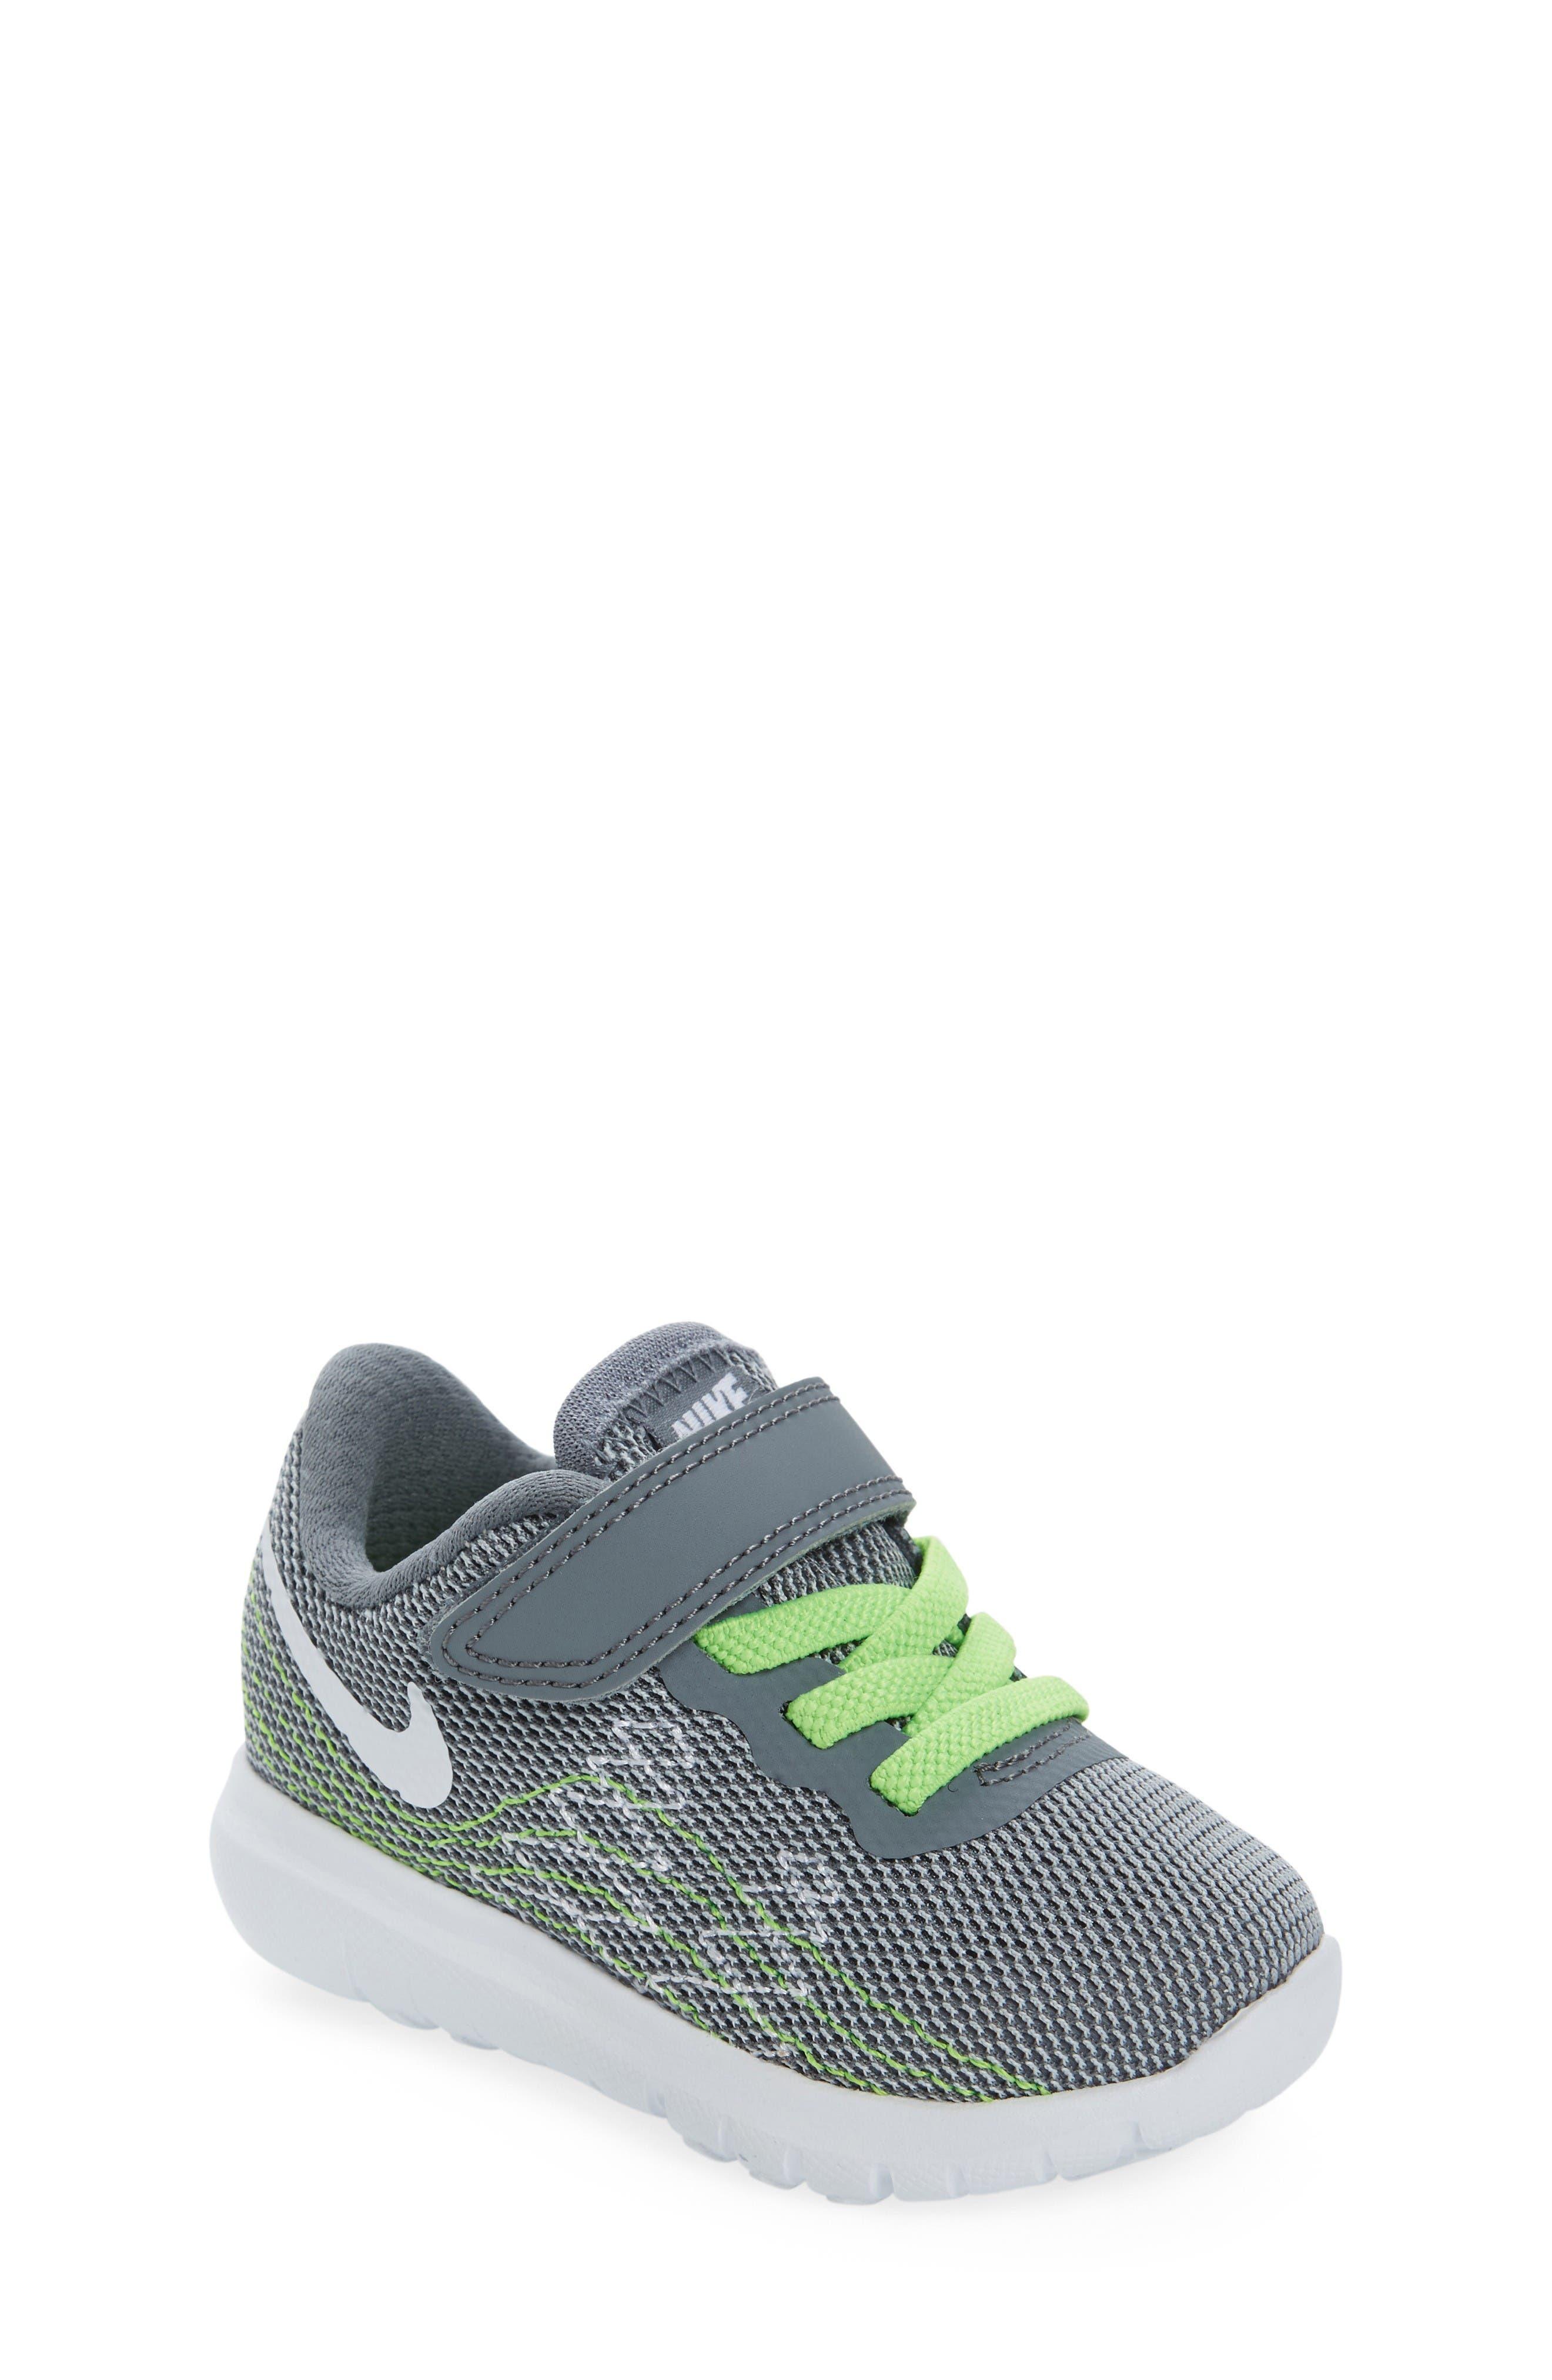 Nike Flex Fury 2 Athletic Shoe Baby Walker & Toddler